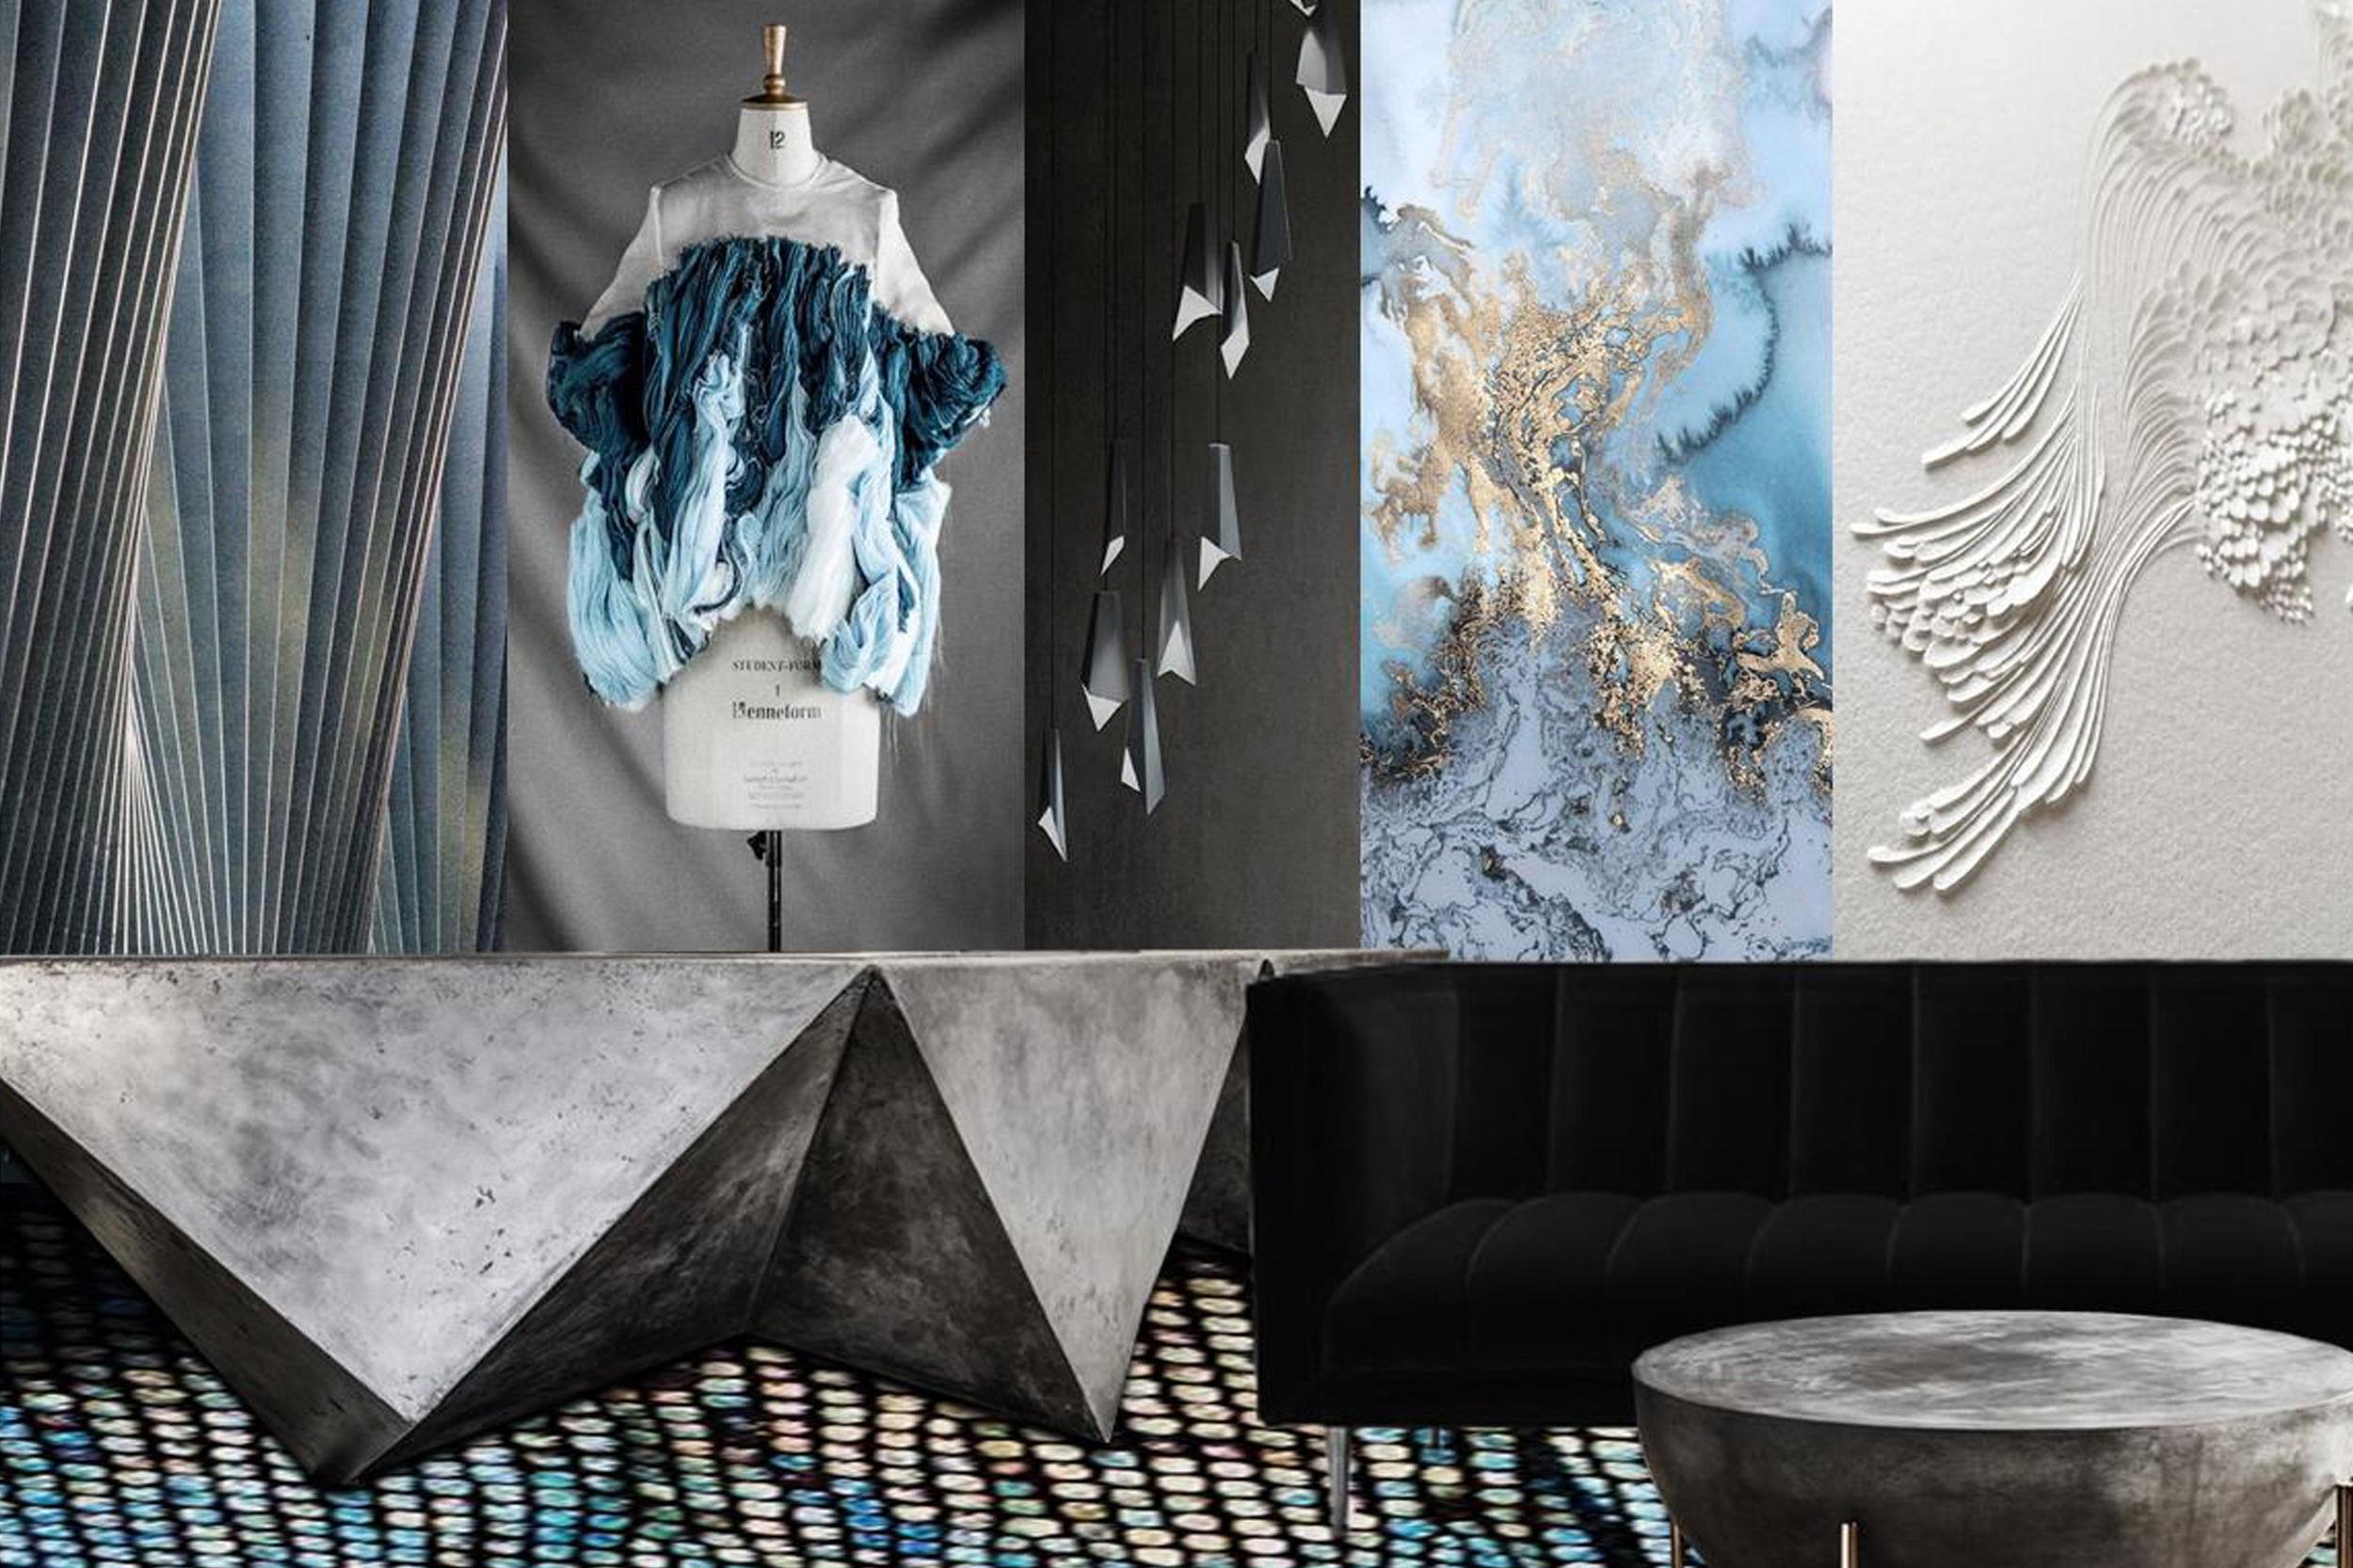 Luxury Interior Design Service in NY, NY and Westport, CT | Joe Ginsberg Design